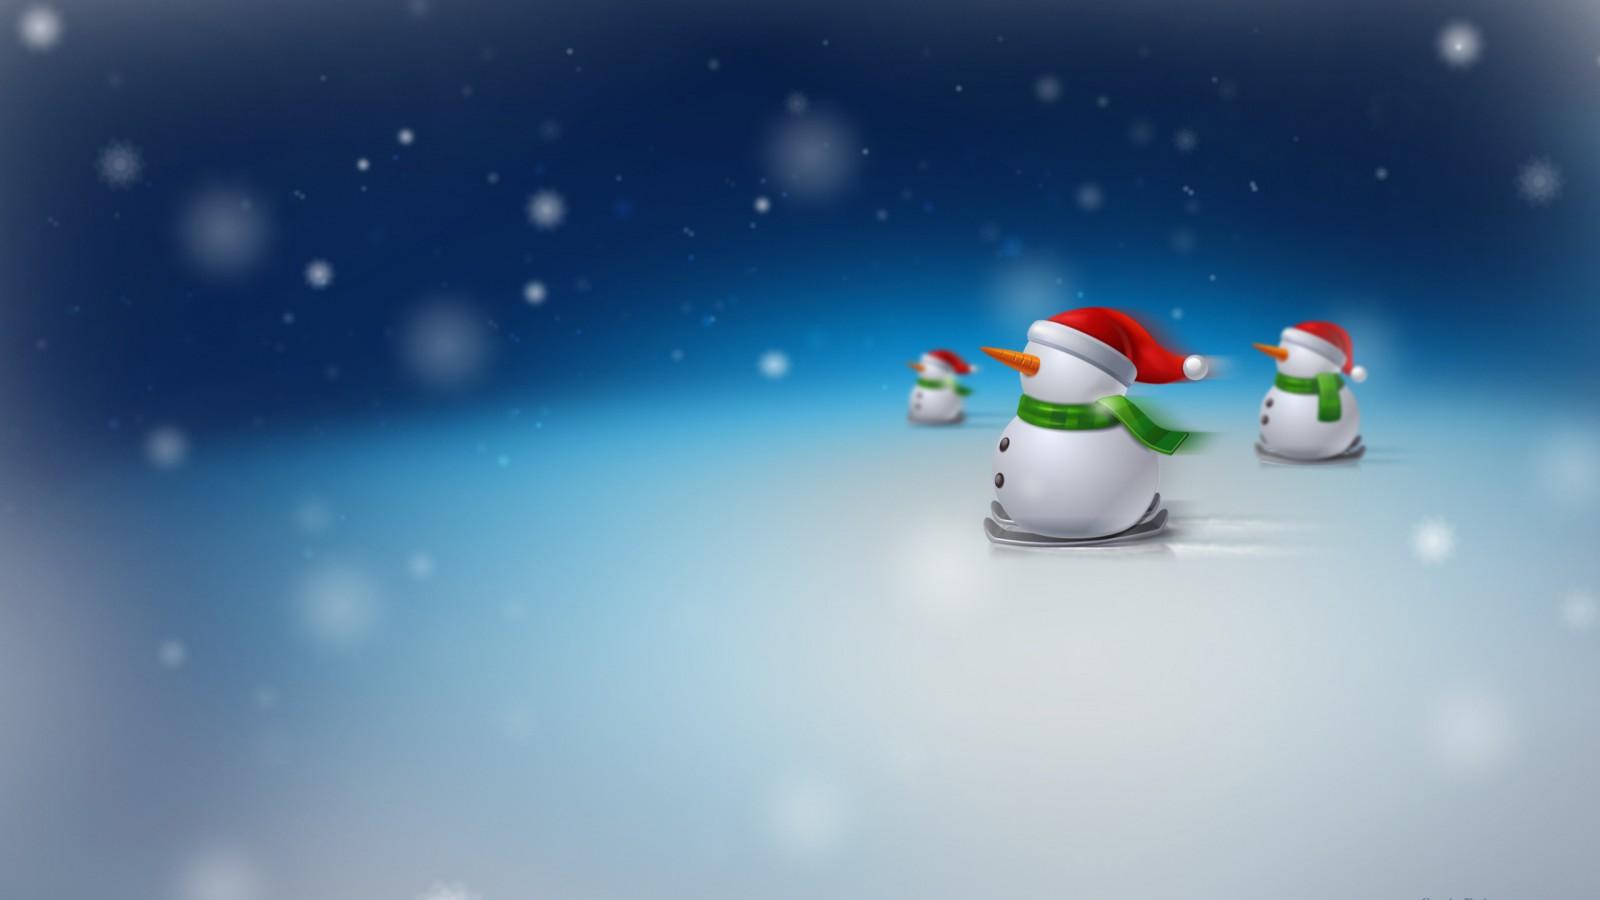 Cute Christmas Iphone 5 Wallpaper Christmas Snowman Santa Hats Wallpapers Hd Wallpapers